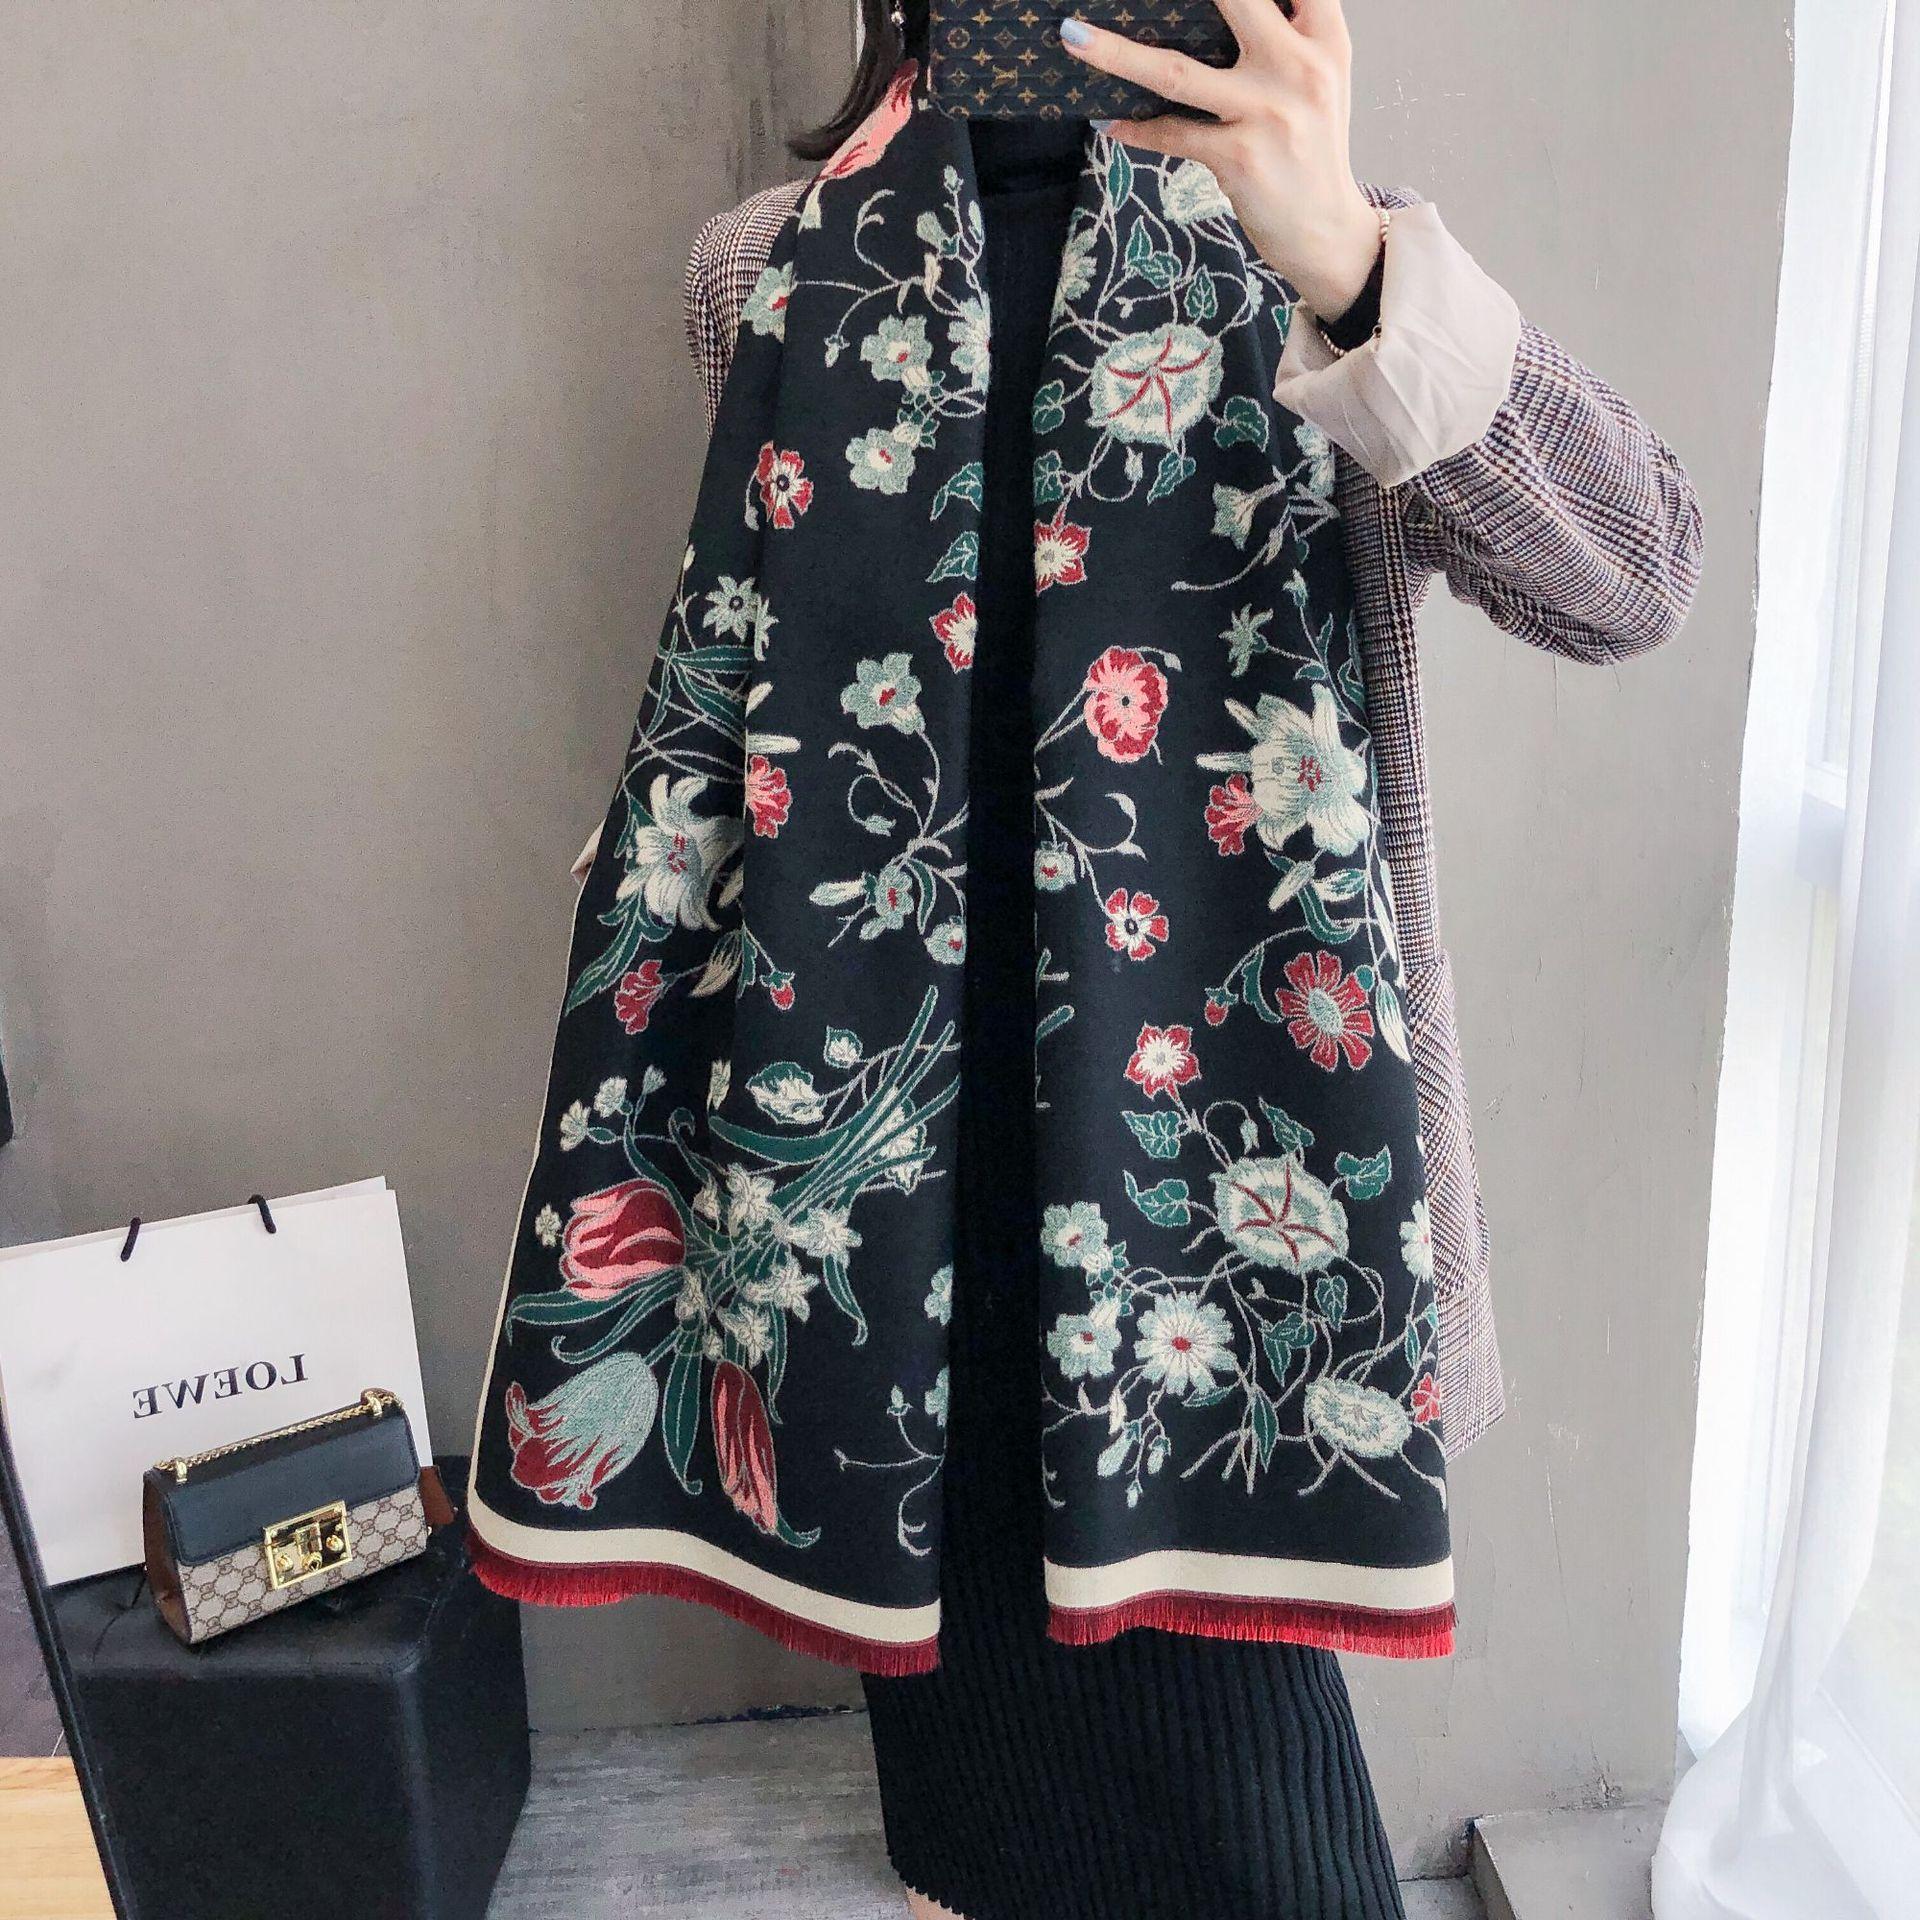 Thick Women Winter Scarf Warm Cashmere Shawls Elegant Floral Print Lady Pashmina Wraps Foulard Bandana Scarves 2020 Design